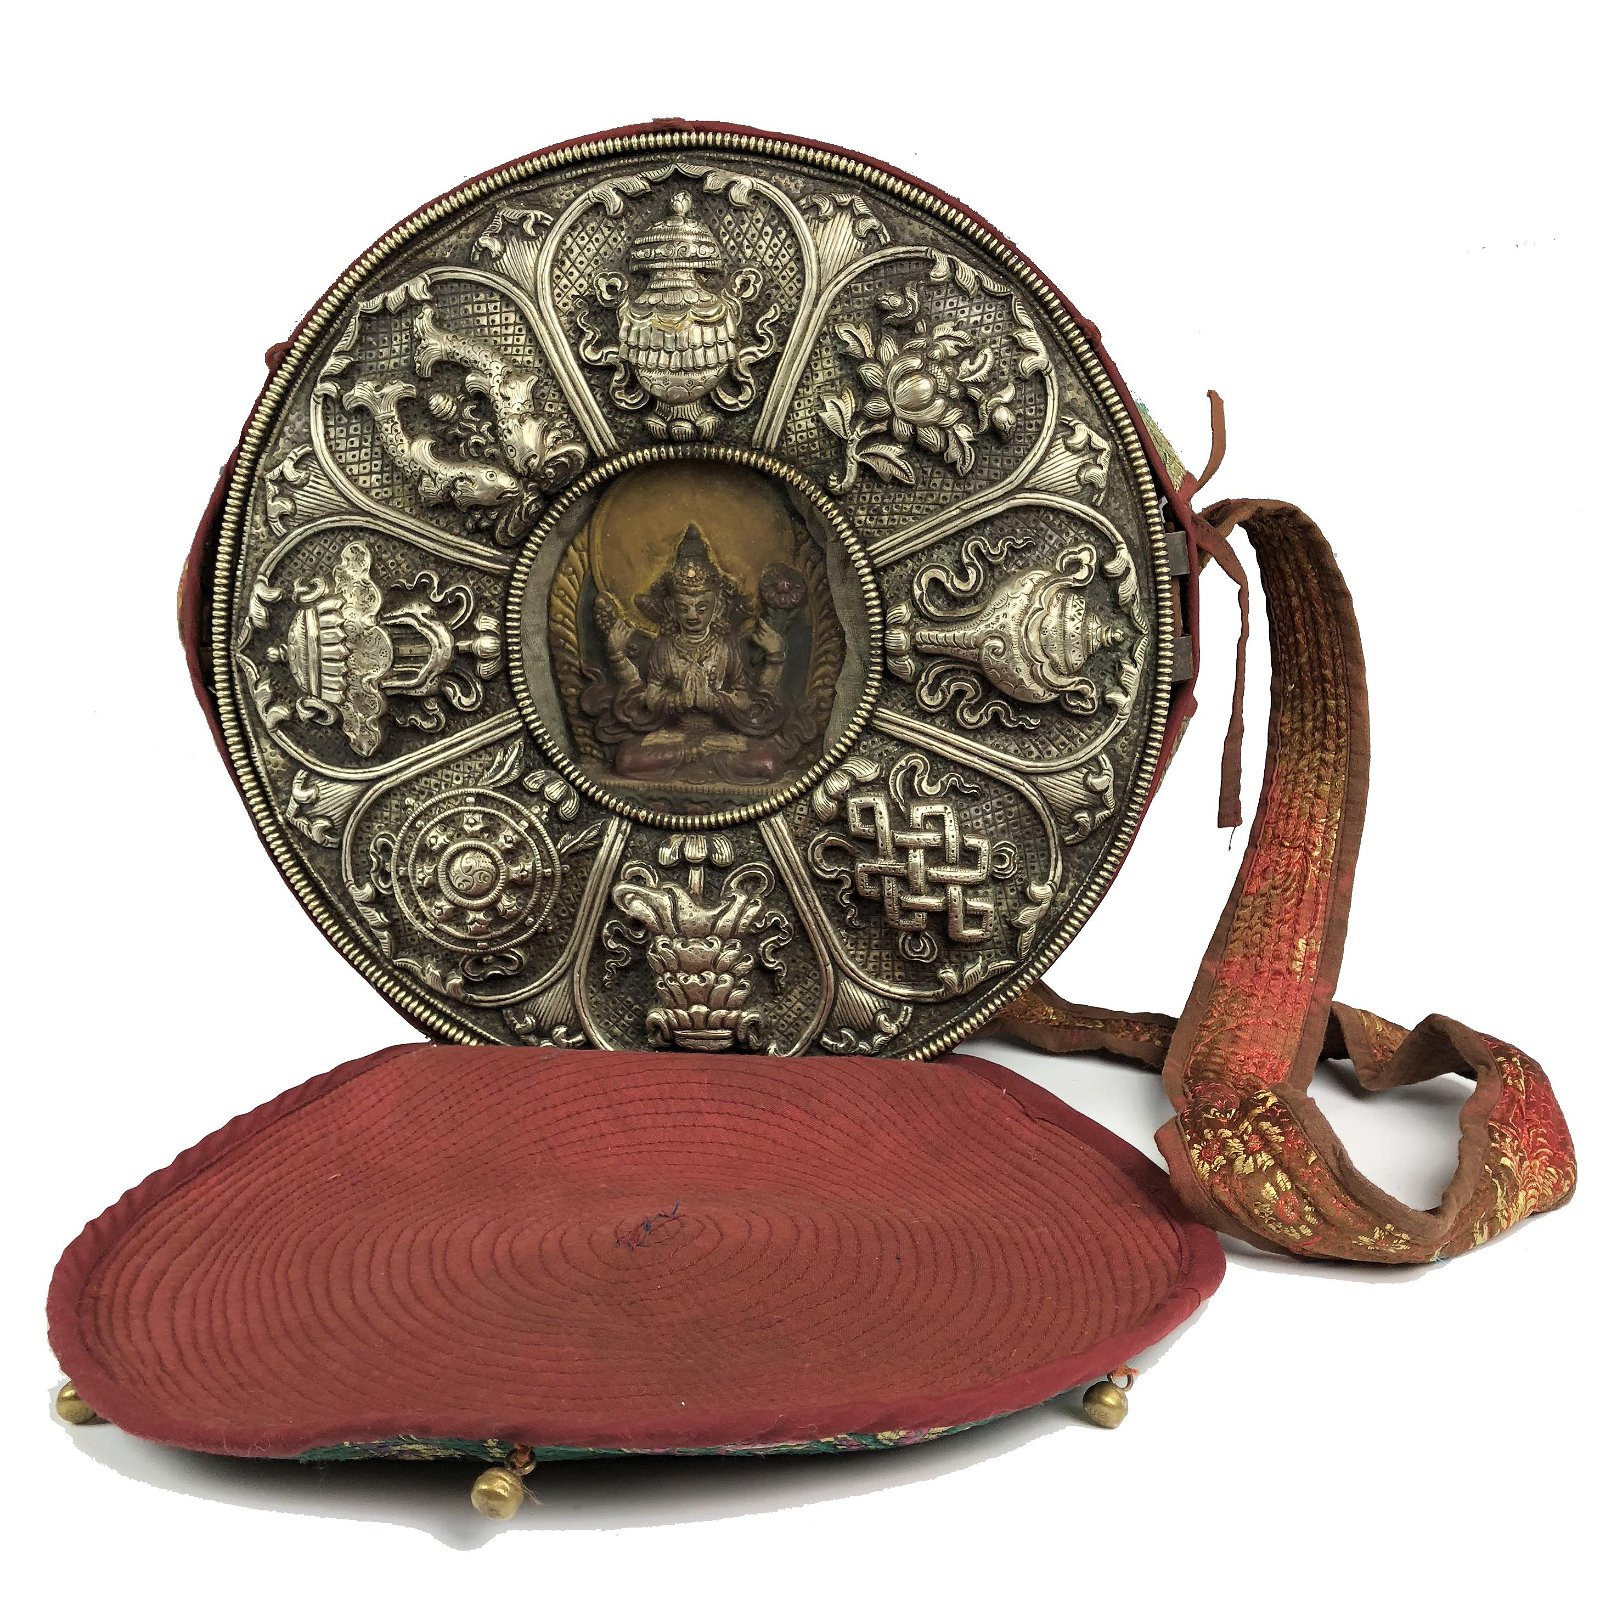 LARGE VERY EXQUISITE TIBETAN SILVER PRAYER BOX